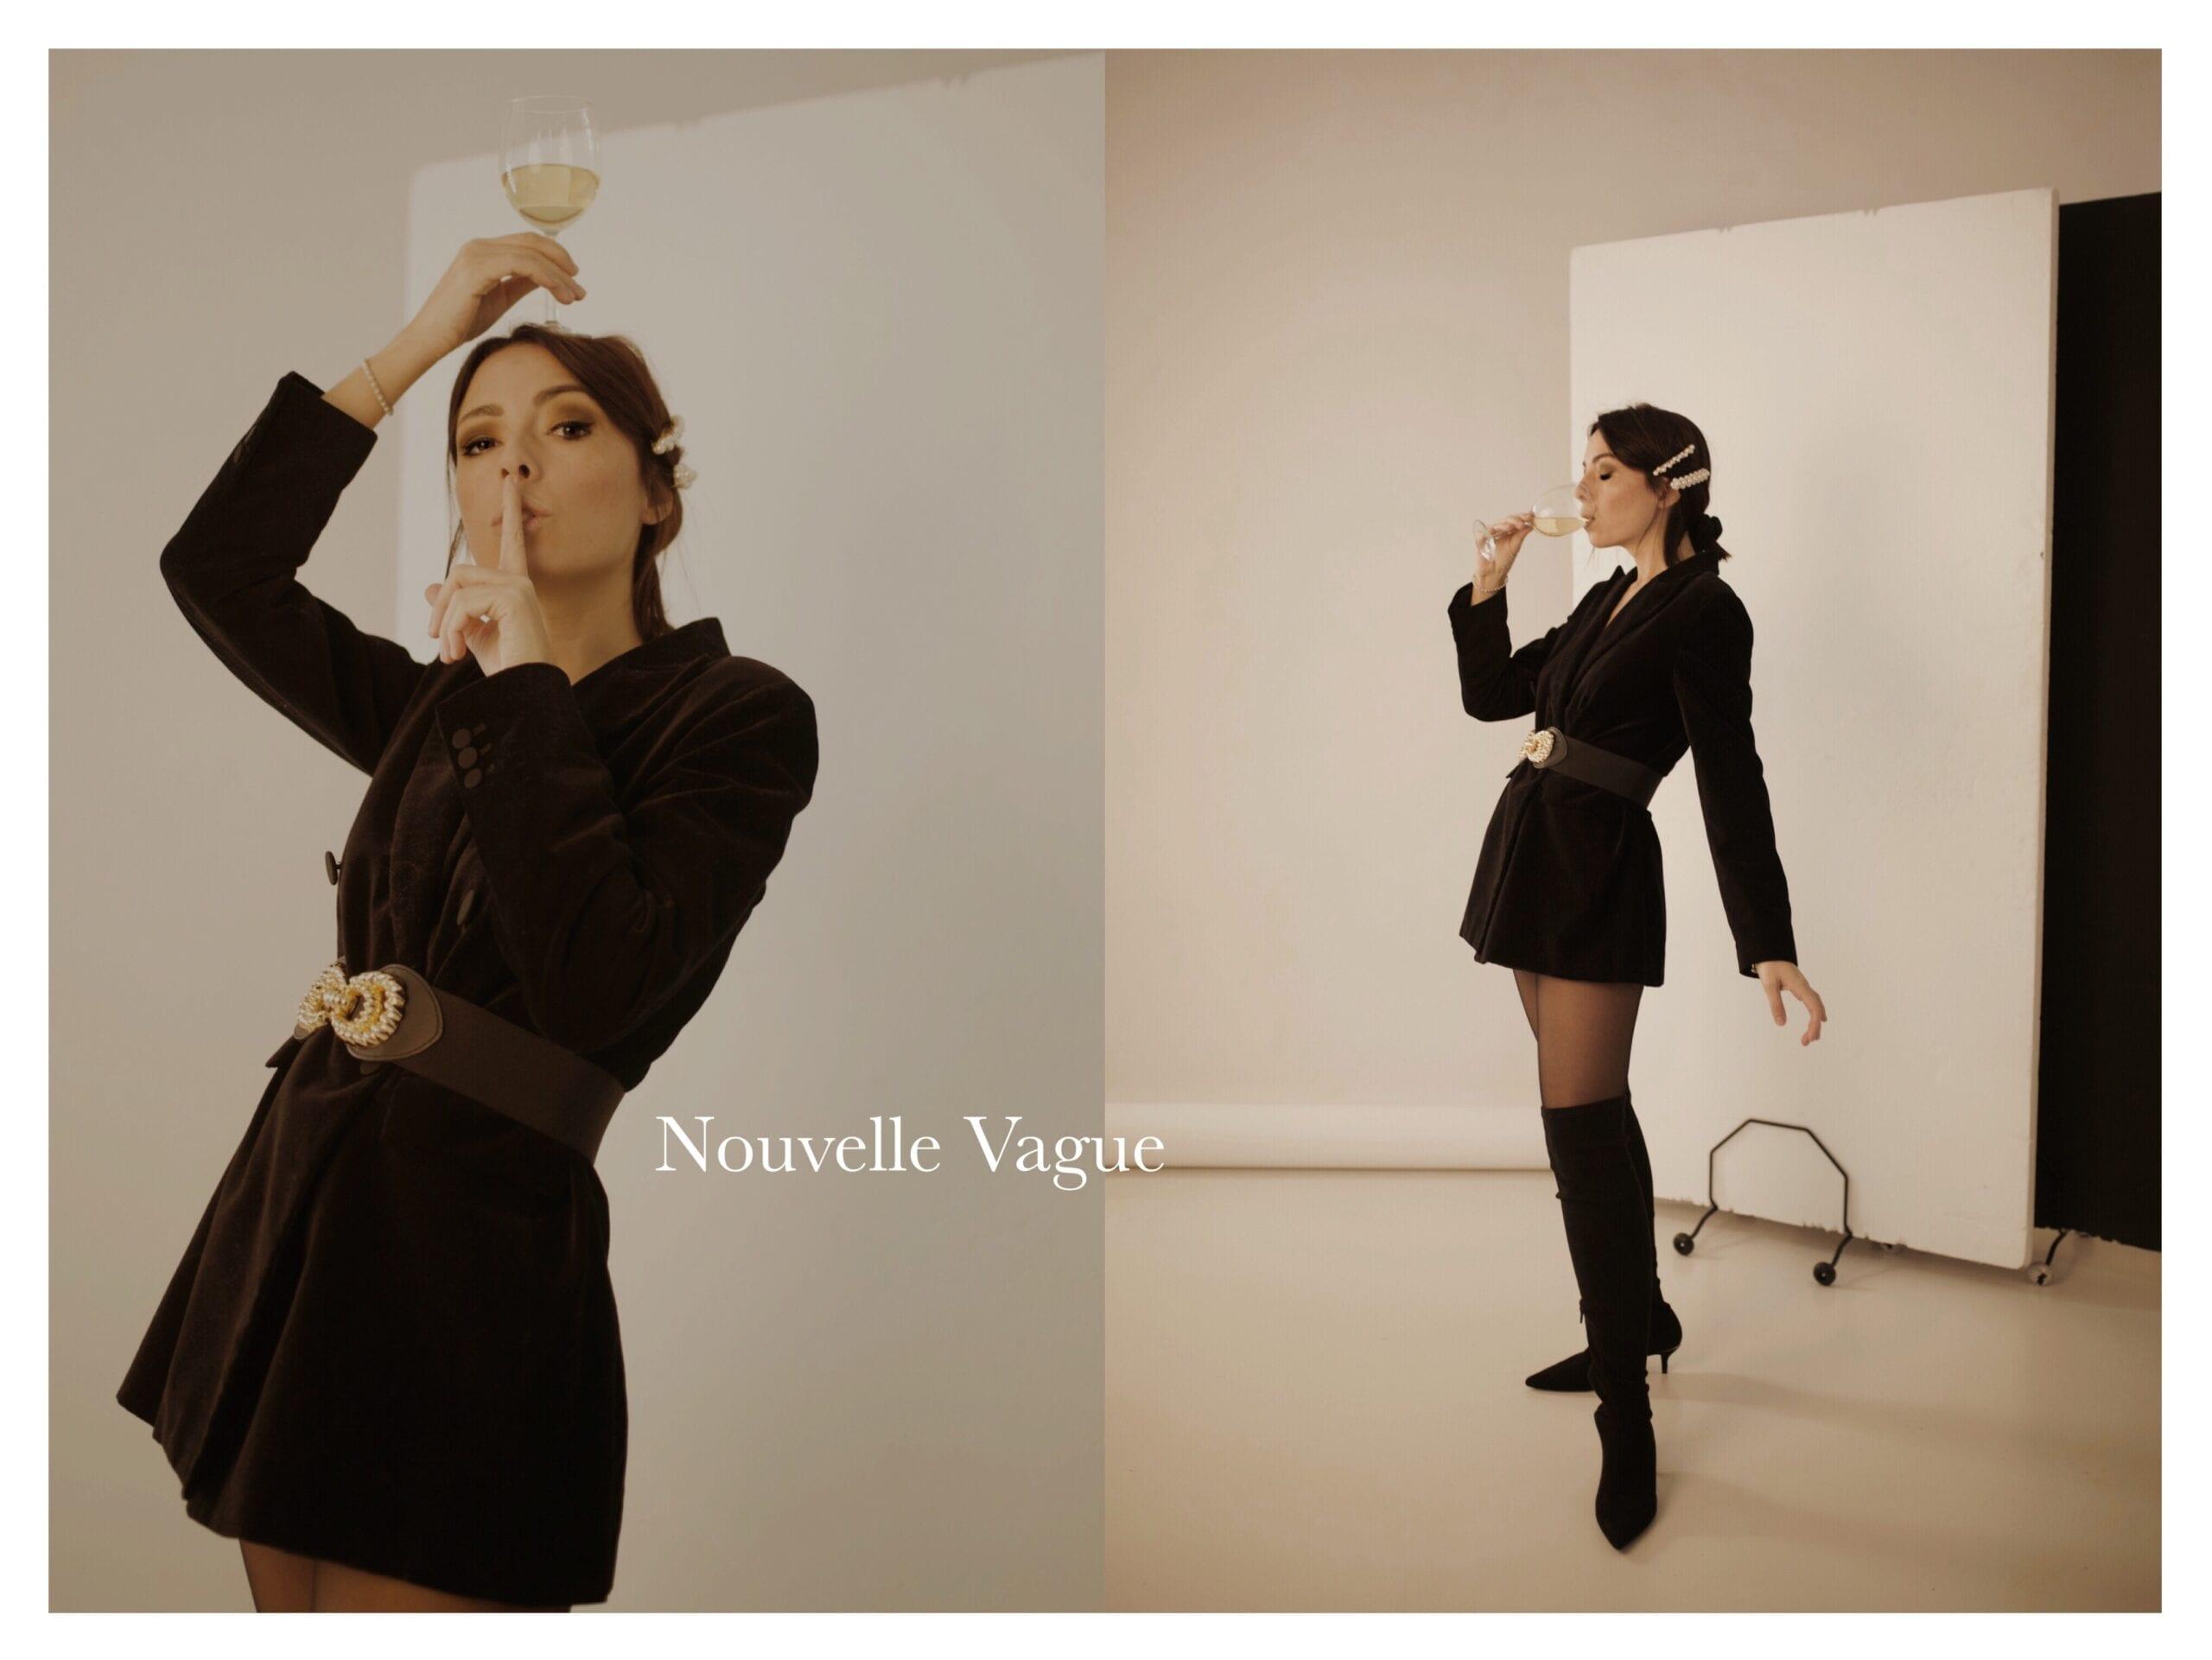 fashion blogger italiane famose, fashion blogger italiane 2019, chi seguire su instagram 2019, blog moda 2019, fashion editorial 2019